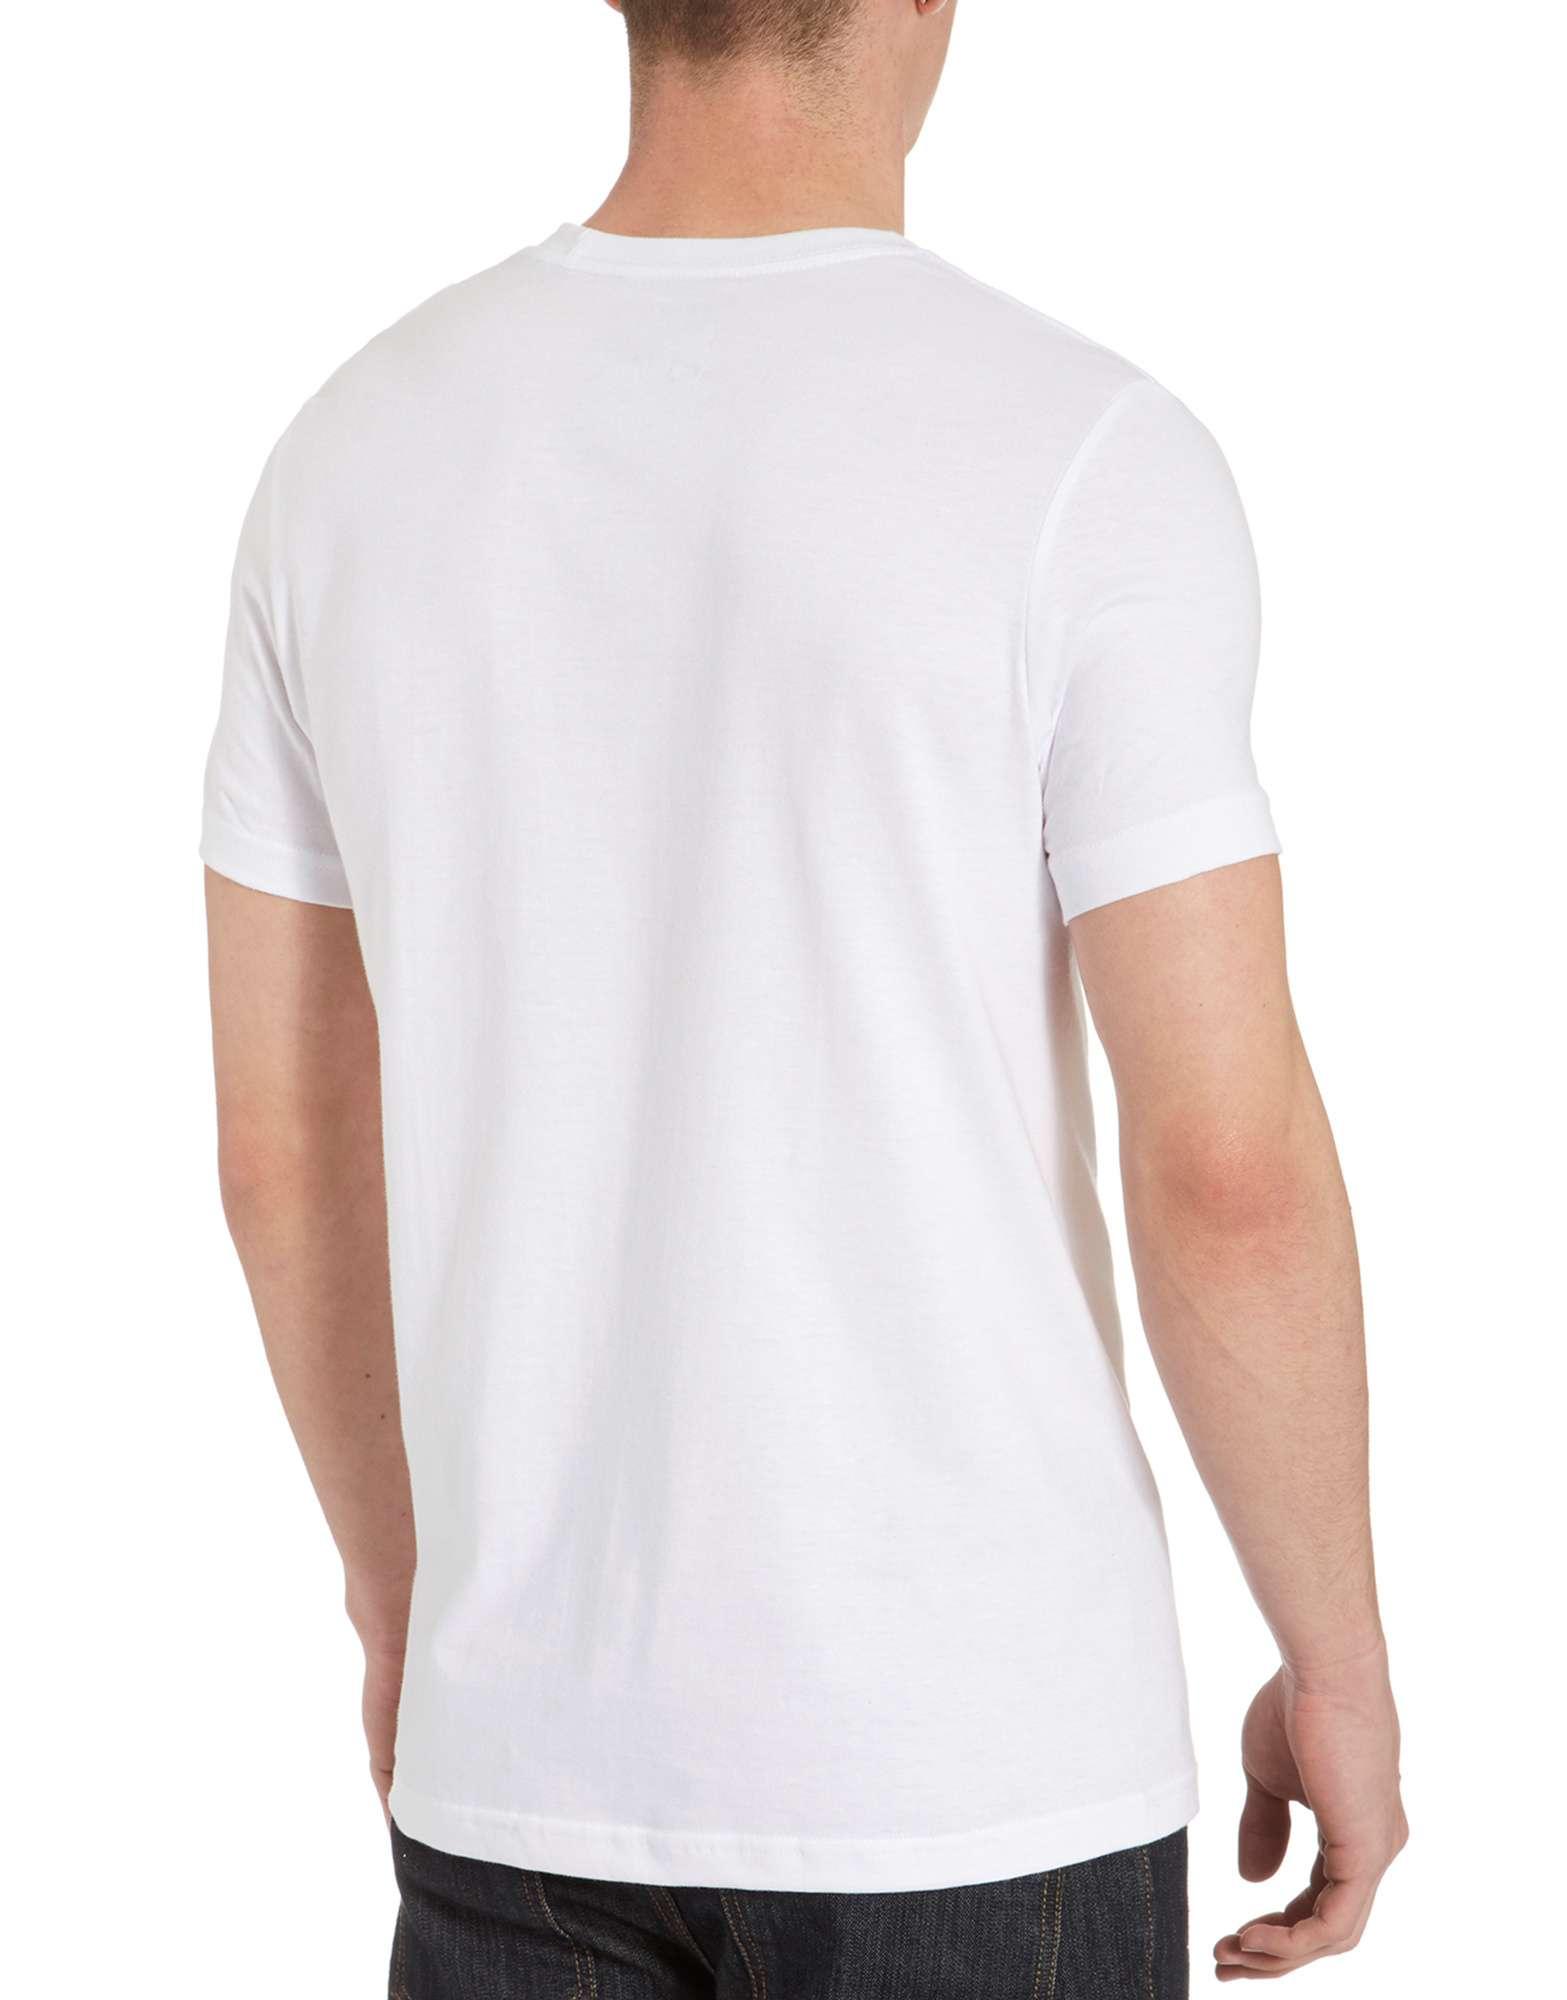 Nike Huarache Print T-Shirt